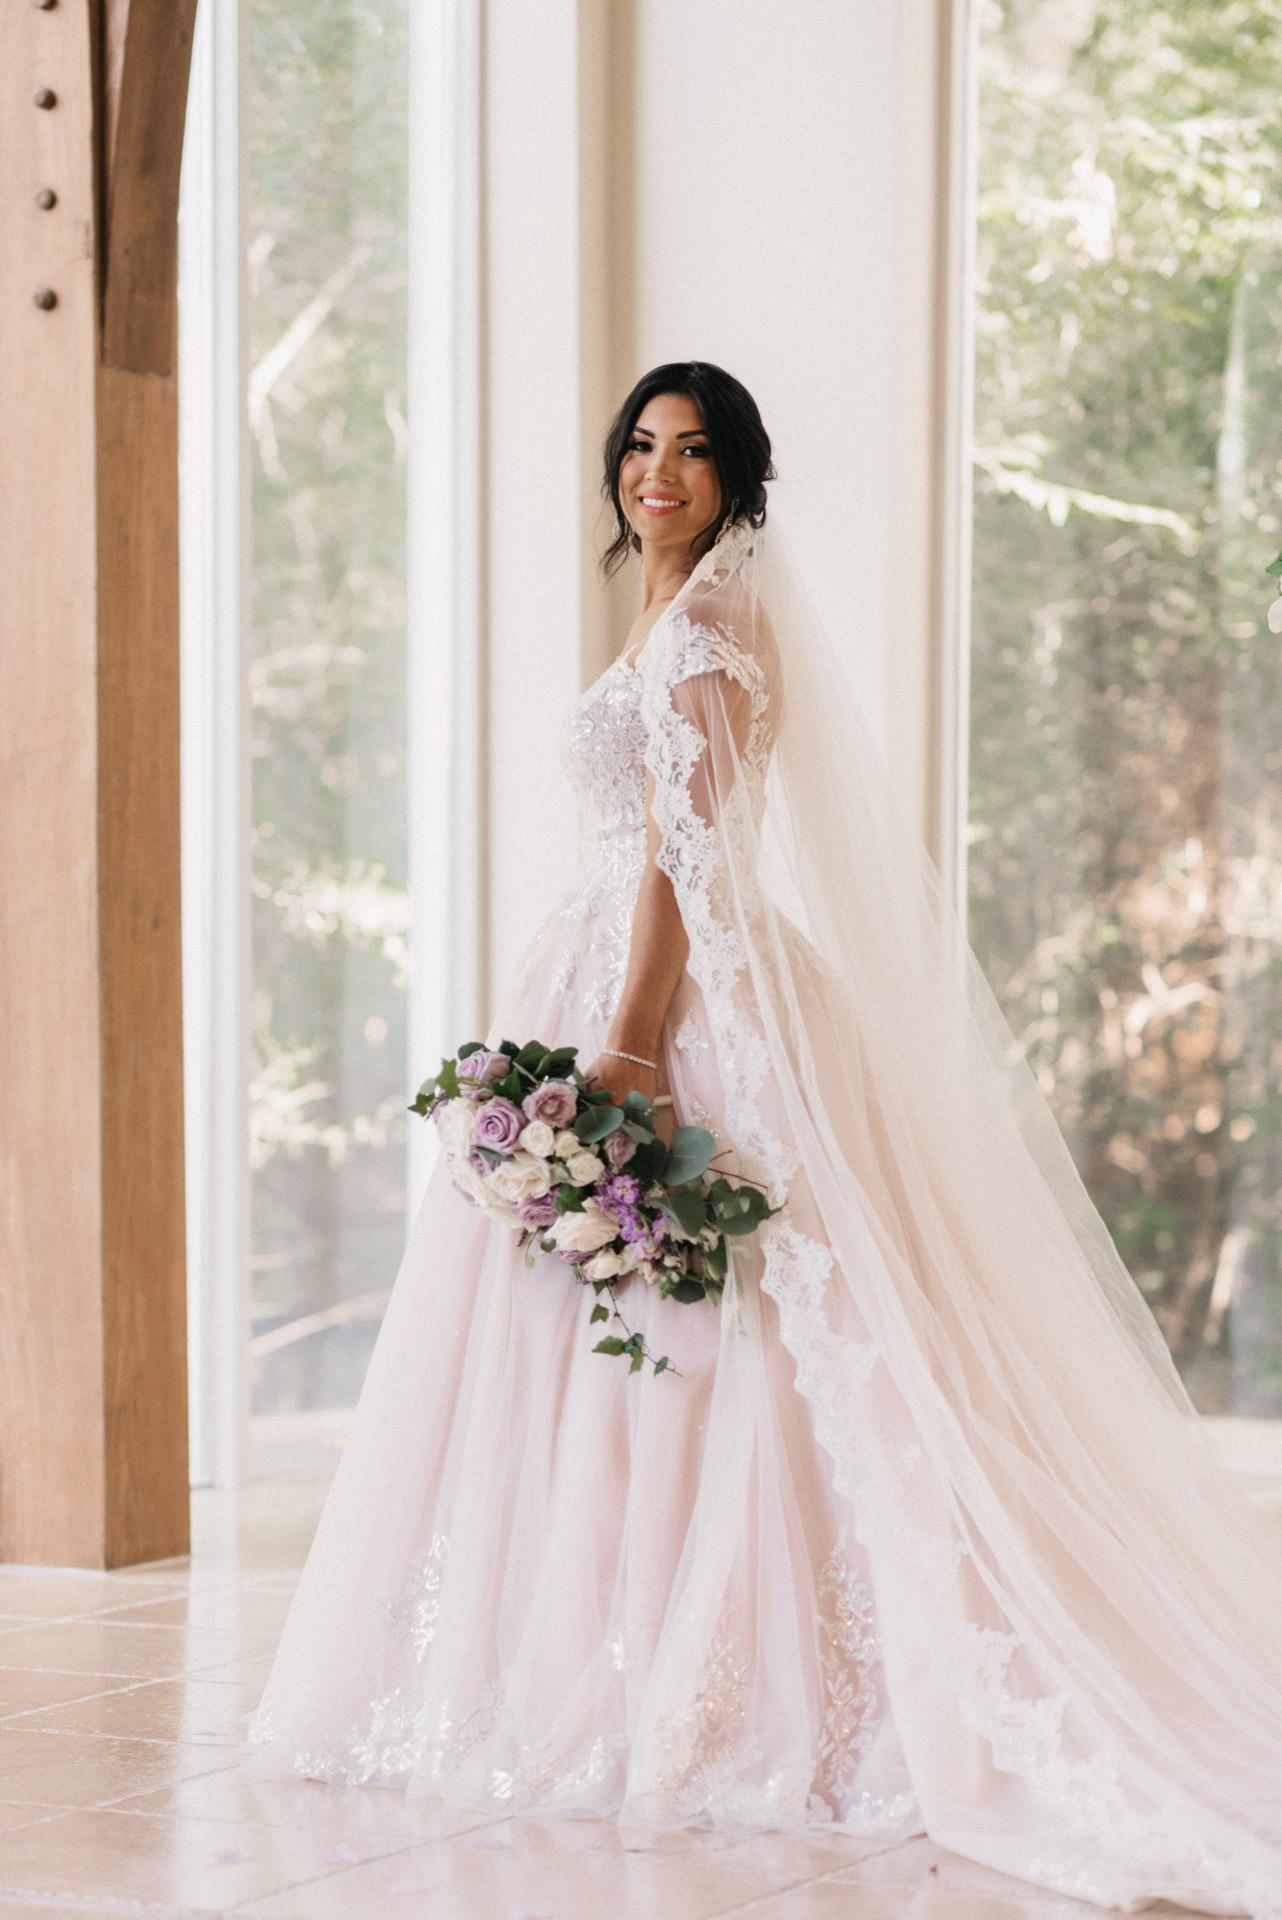 lexi-michael-wedding-blog-sm-80.jpg